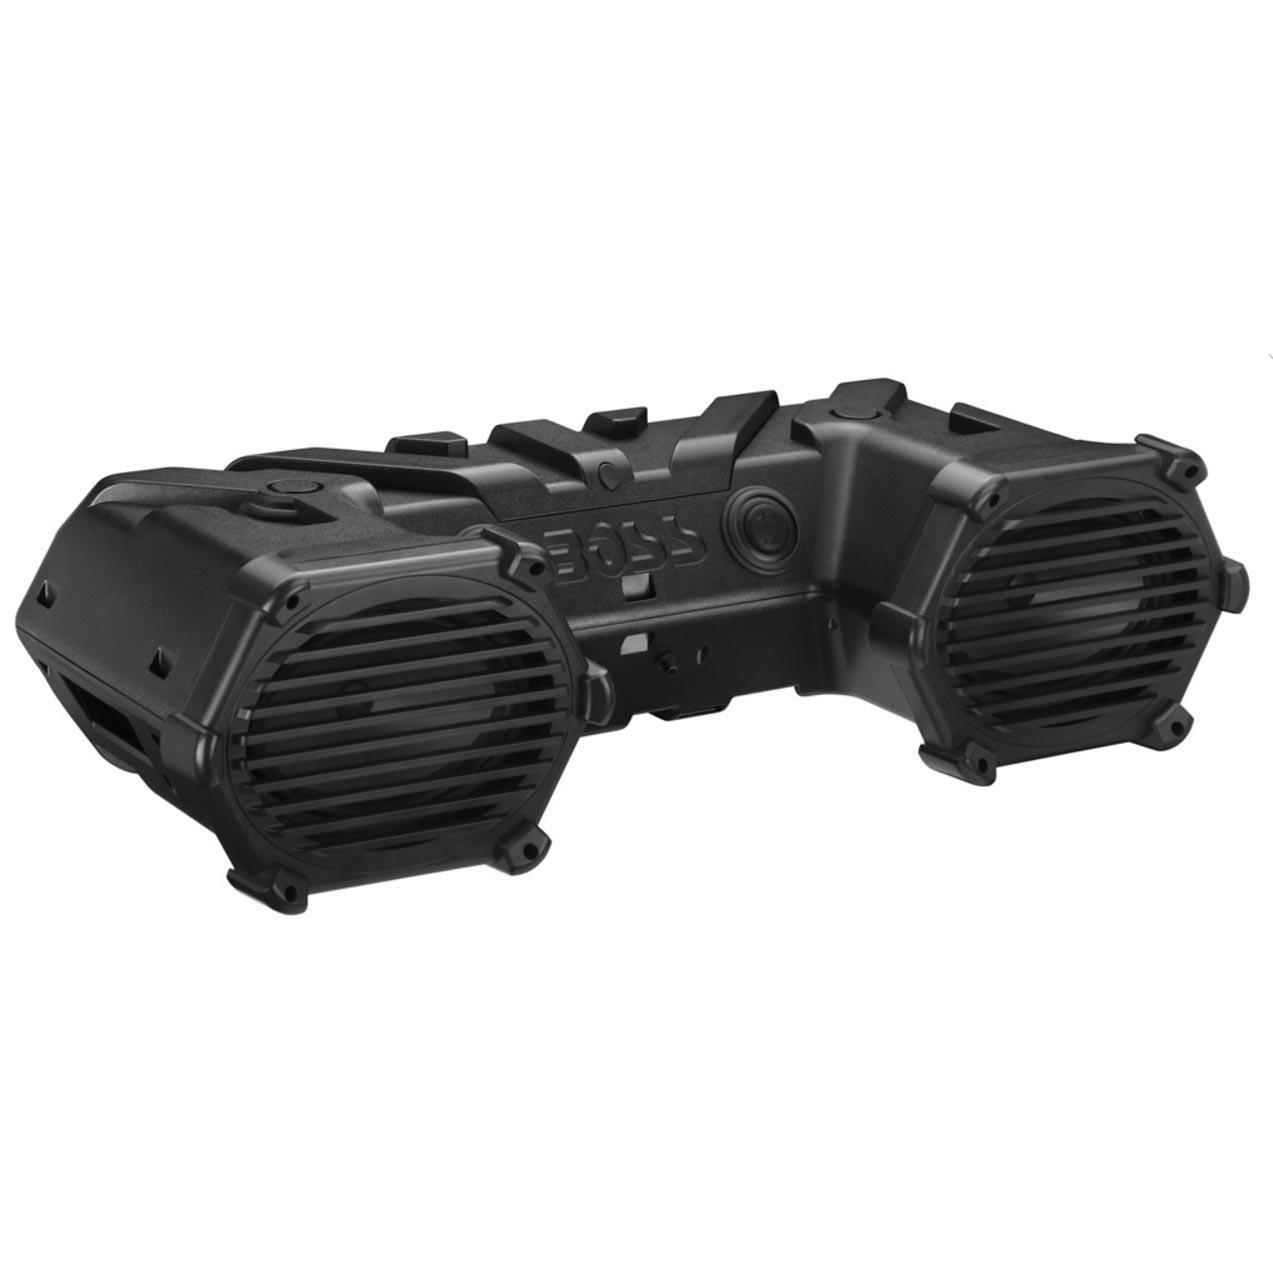 BOSS Audio ATVB69 Bluetooth, Amplified,  ATV/UTV Sound System, Weather-Proof Marine Grade, Bluetooth Remote, 12 Volt Application Friendly